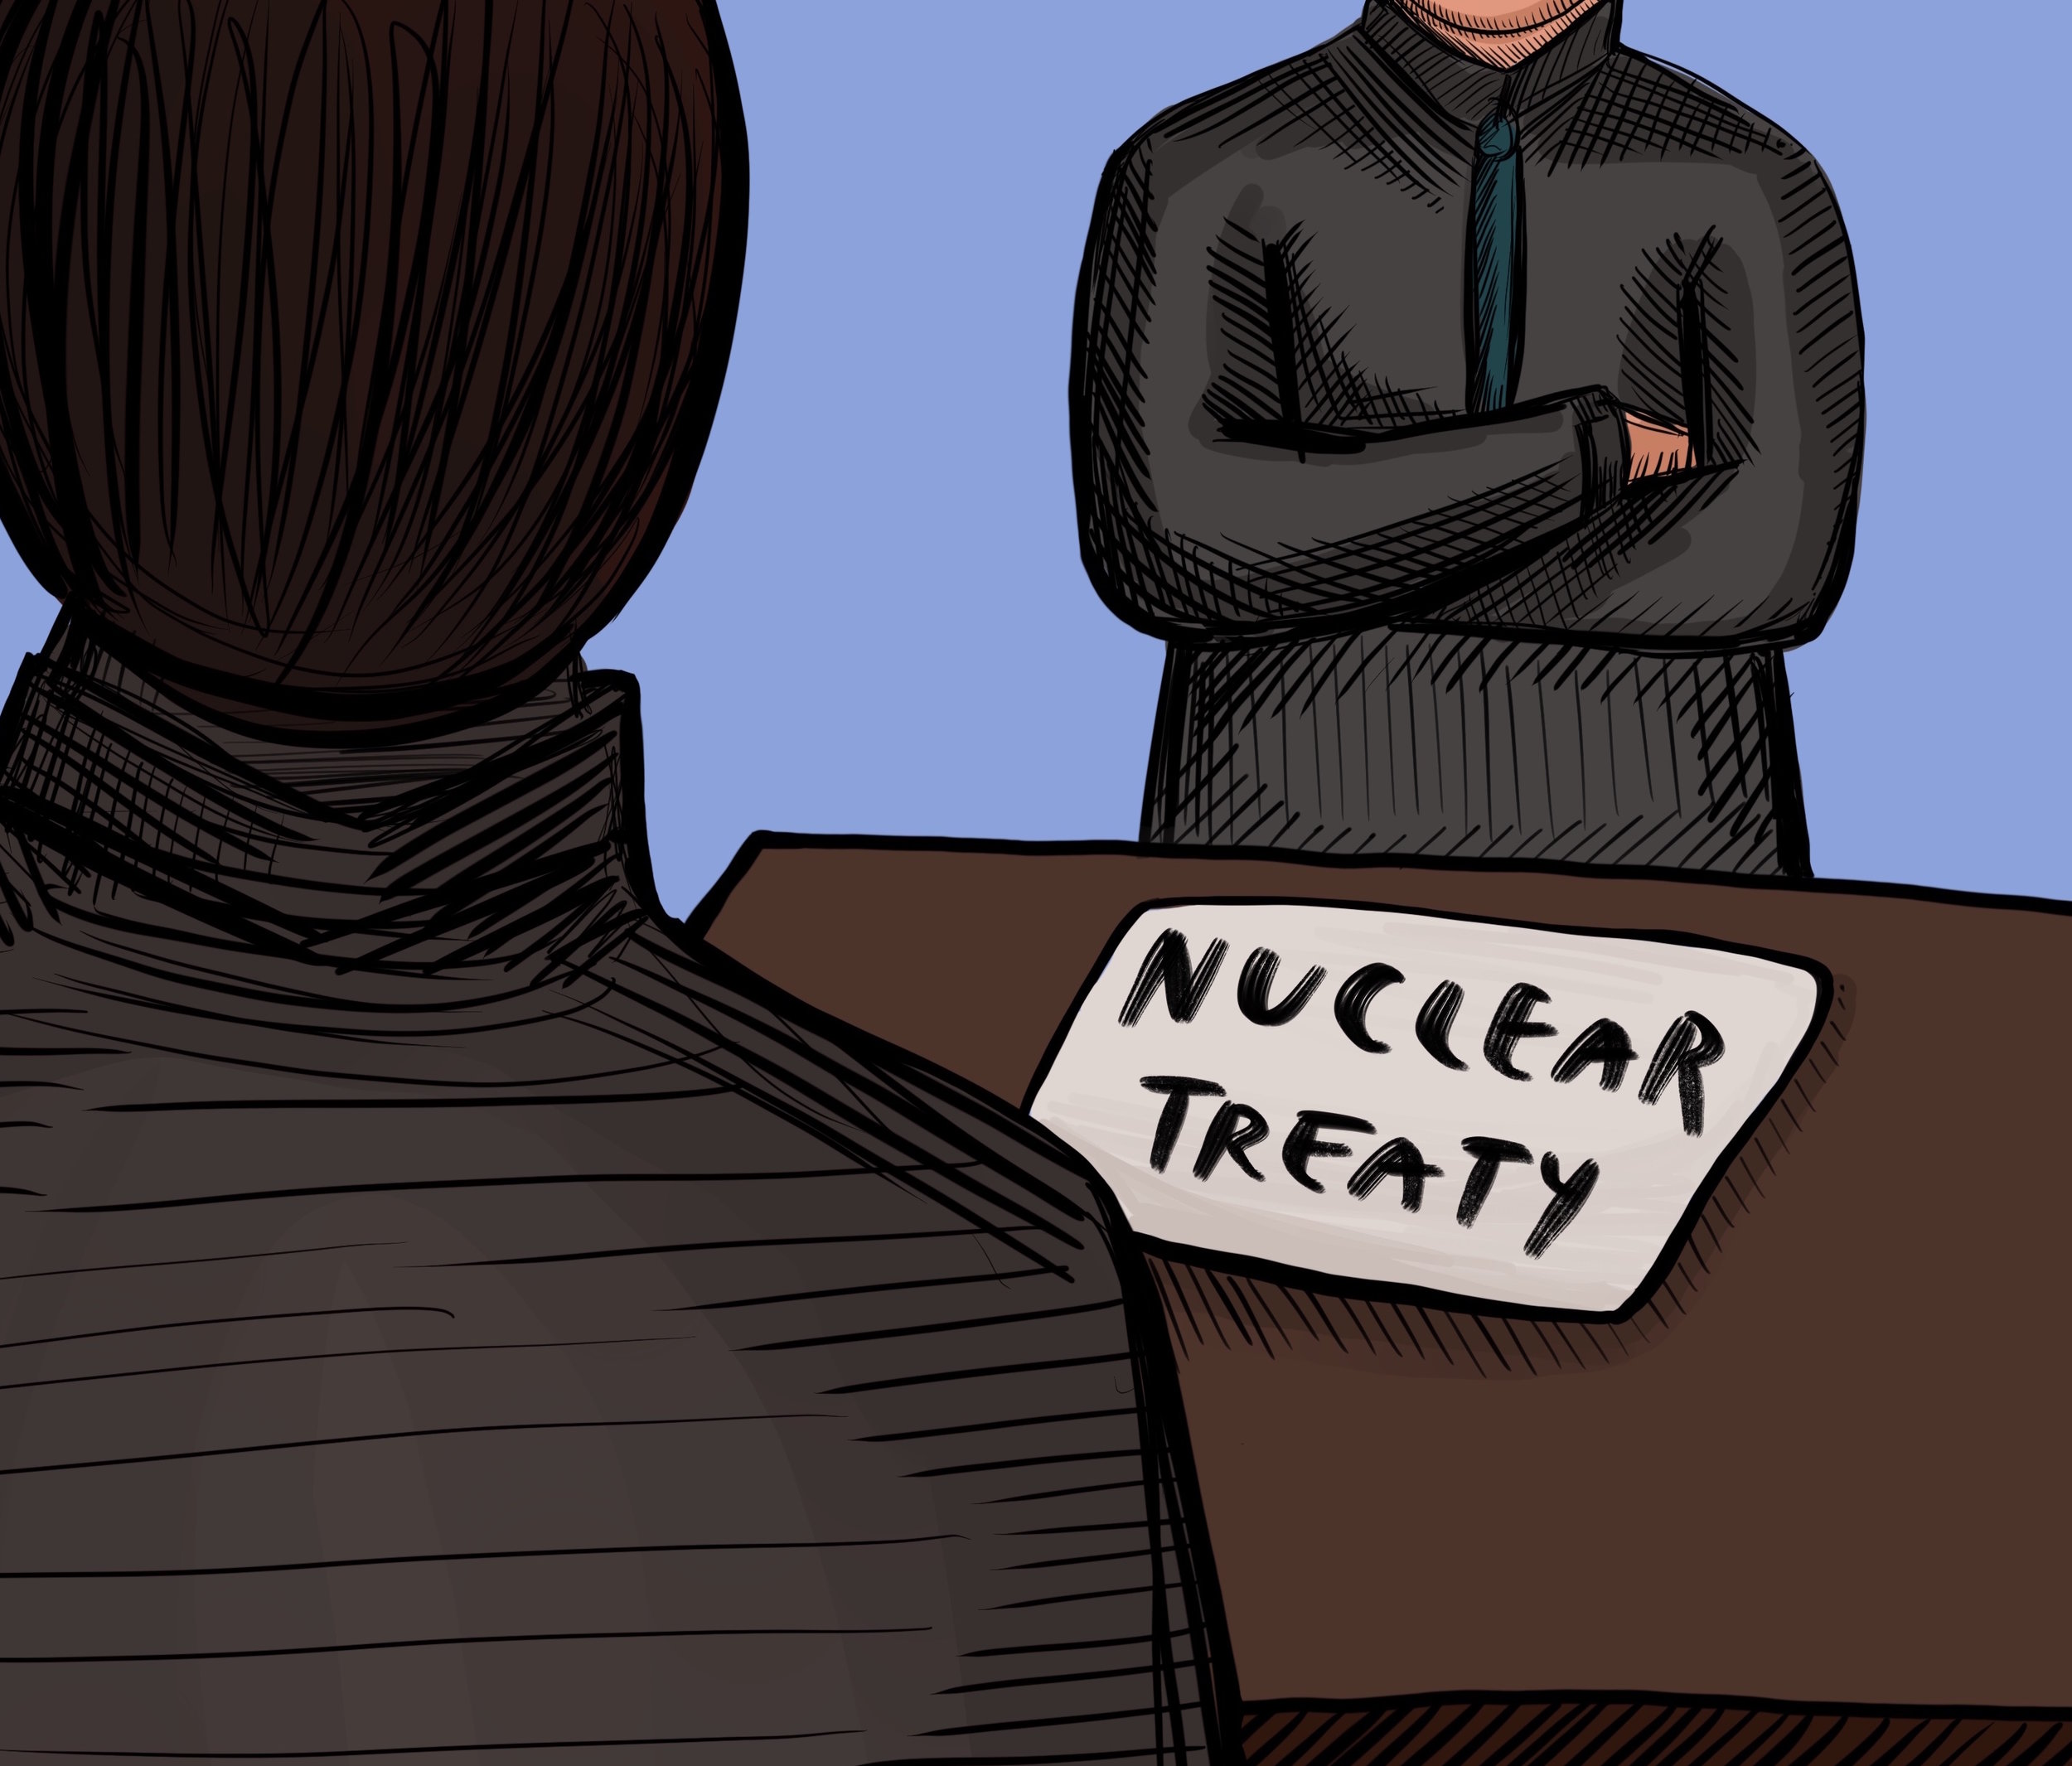 NuclearTreatyAnjaliRao-Herel2022.jpeg